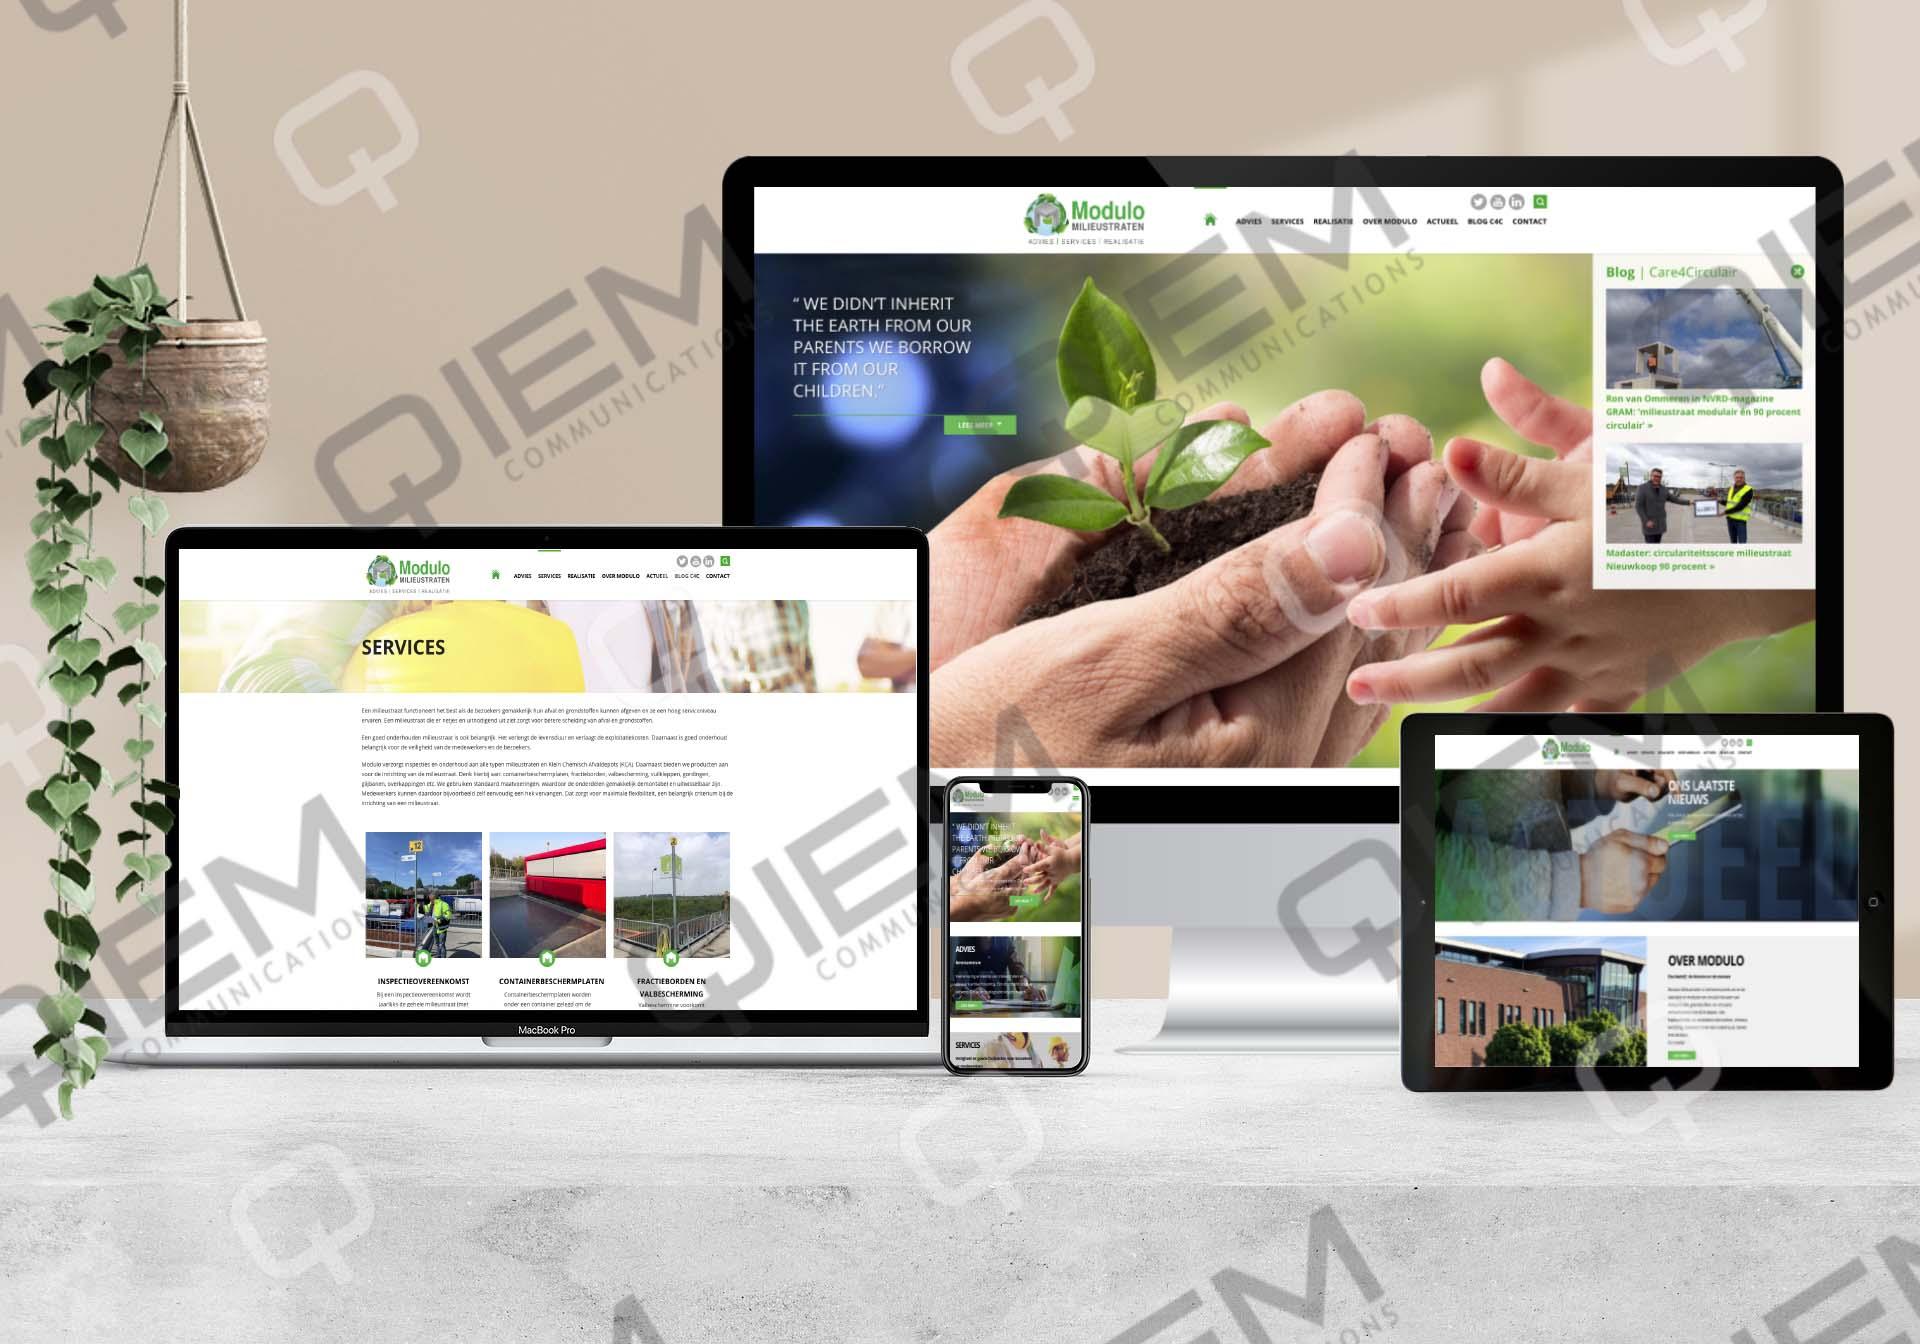 04-28 modulo website MOCKUP